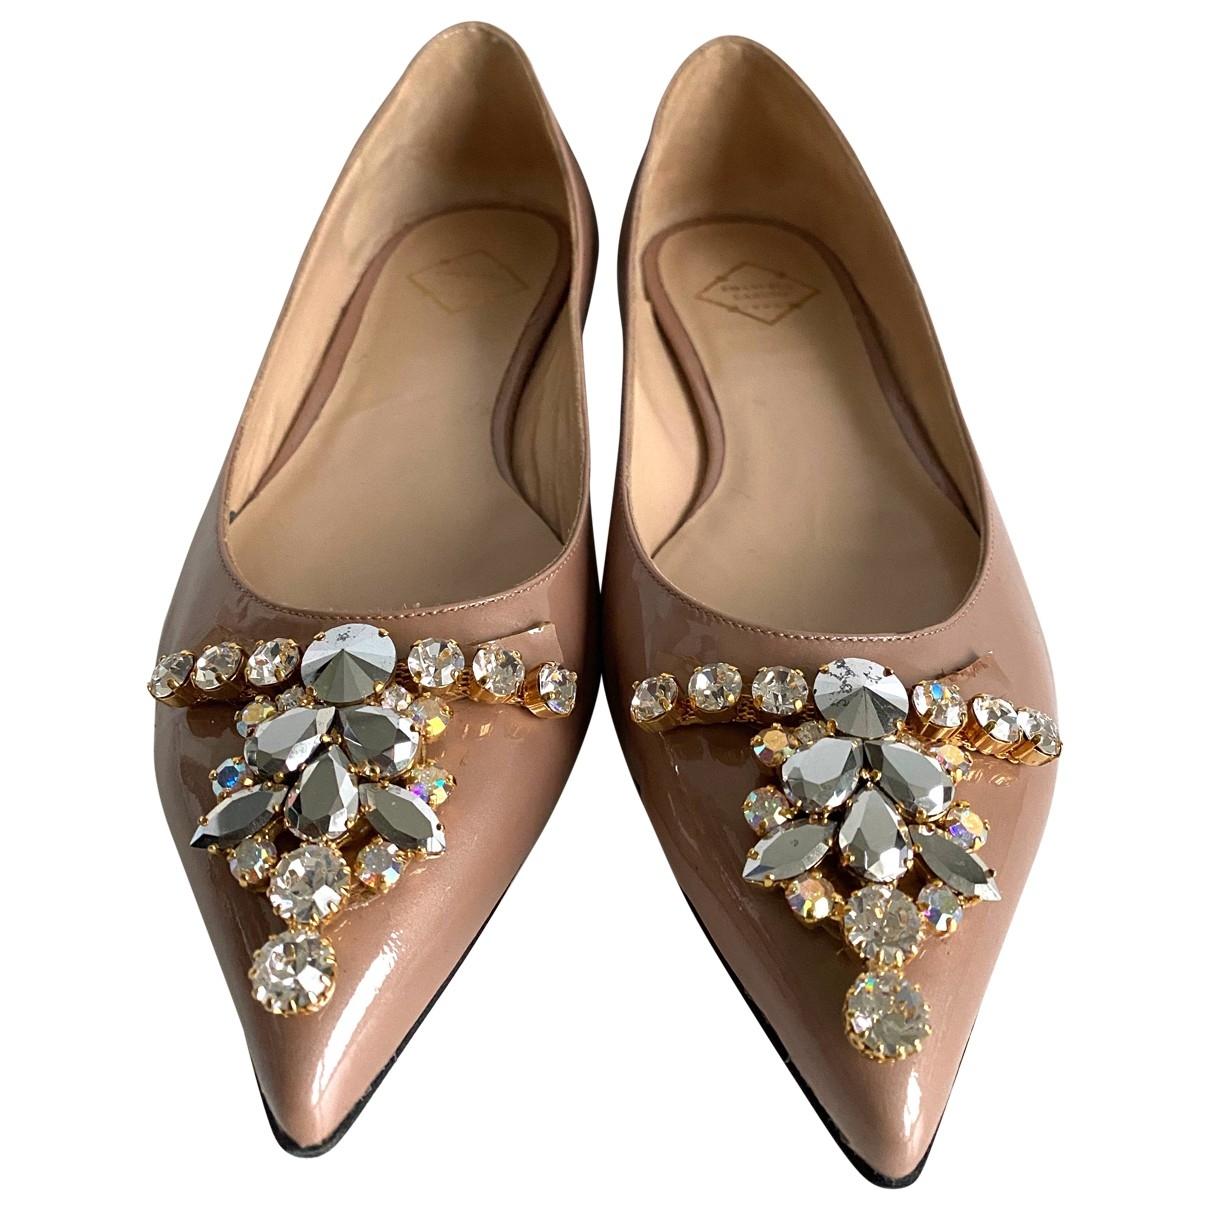 Emanuela Caruso Capri \N Ballerinas in  Beige Lackleder